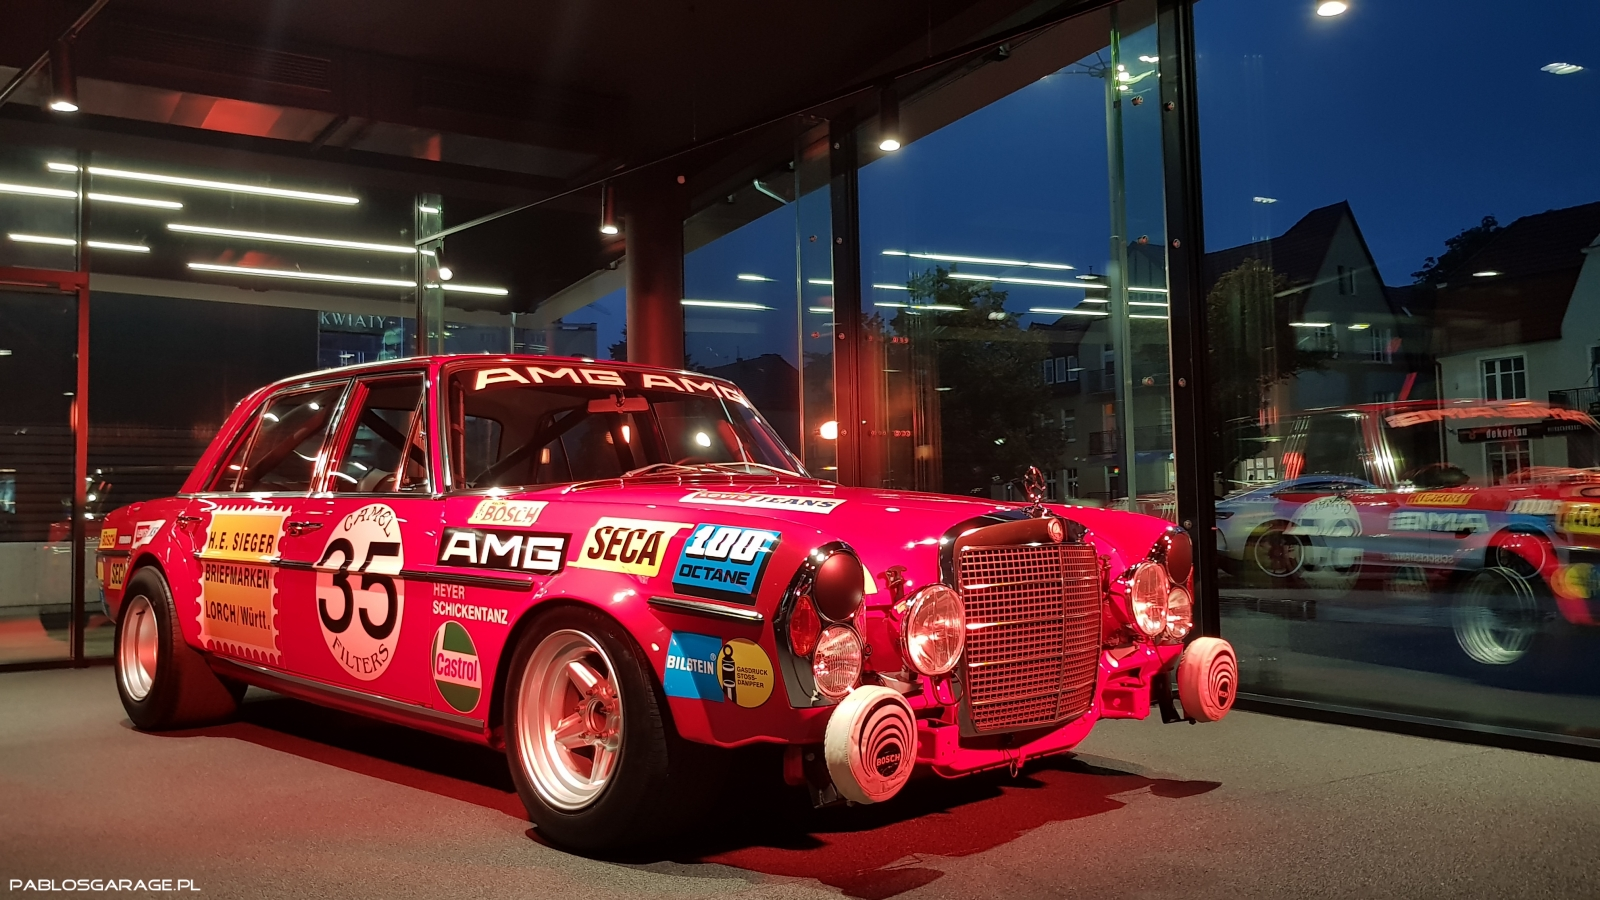 Mercedes 300 SEL V8 6.3 AMG, Red Pig, Czerwona Świnia